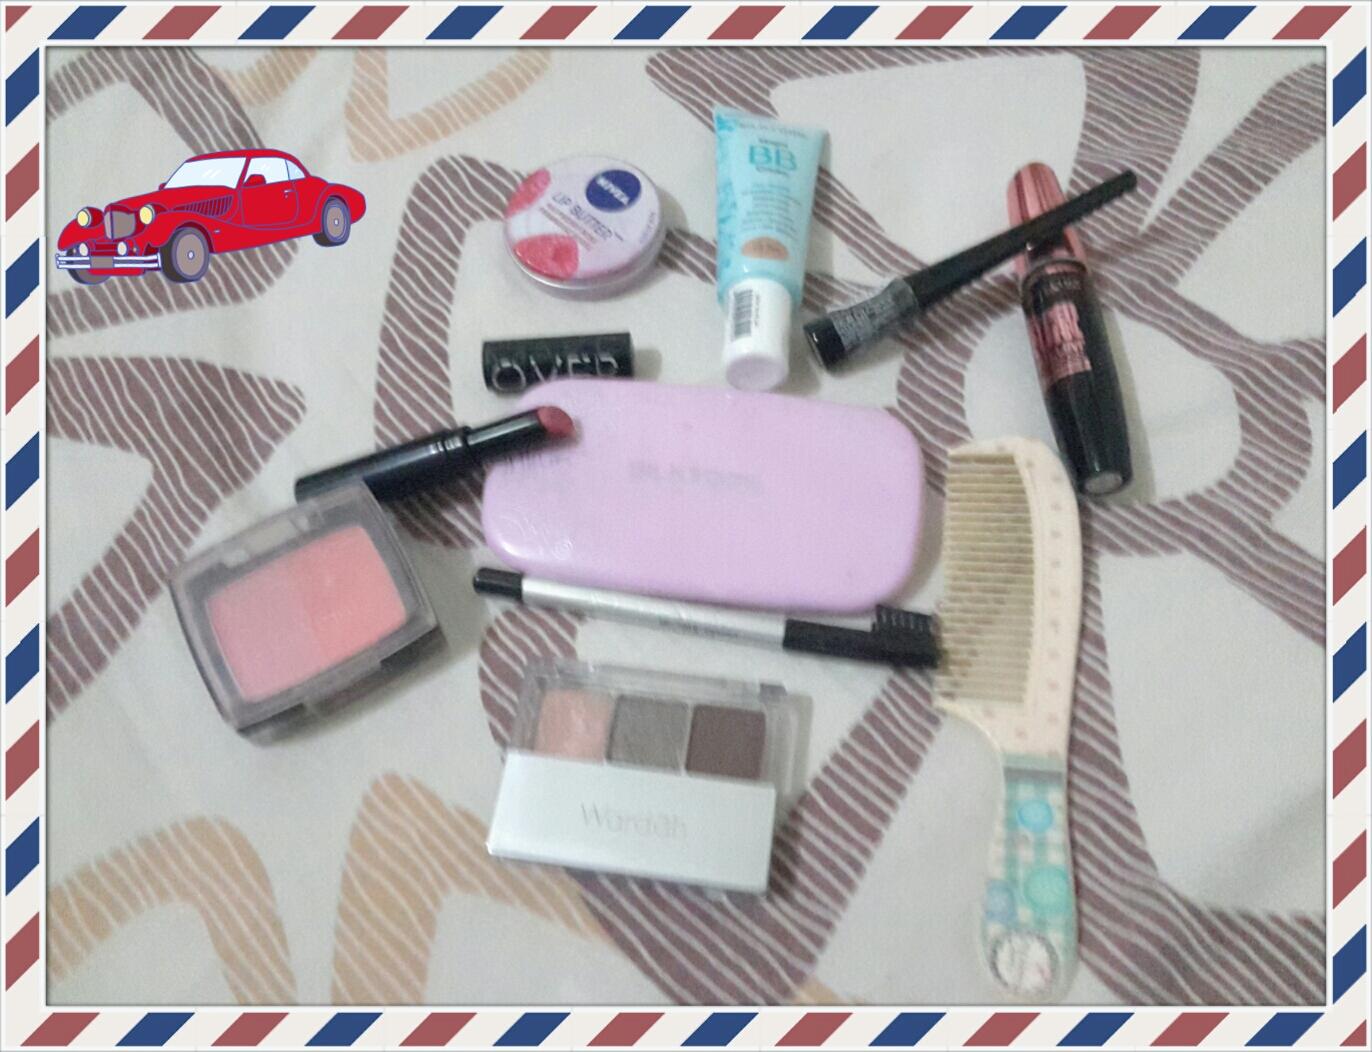 Travel Kit Cosmetics